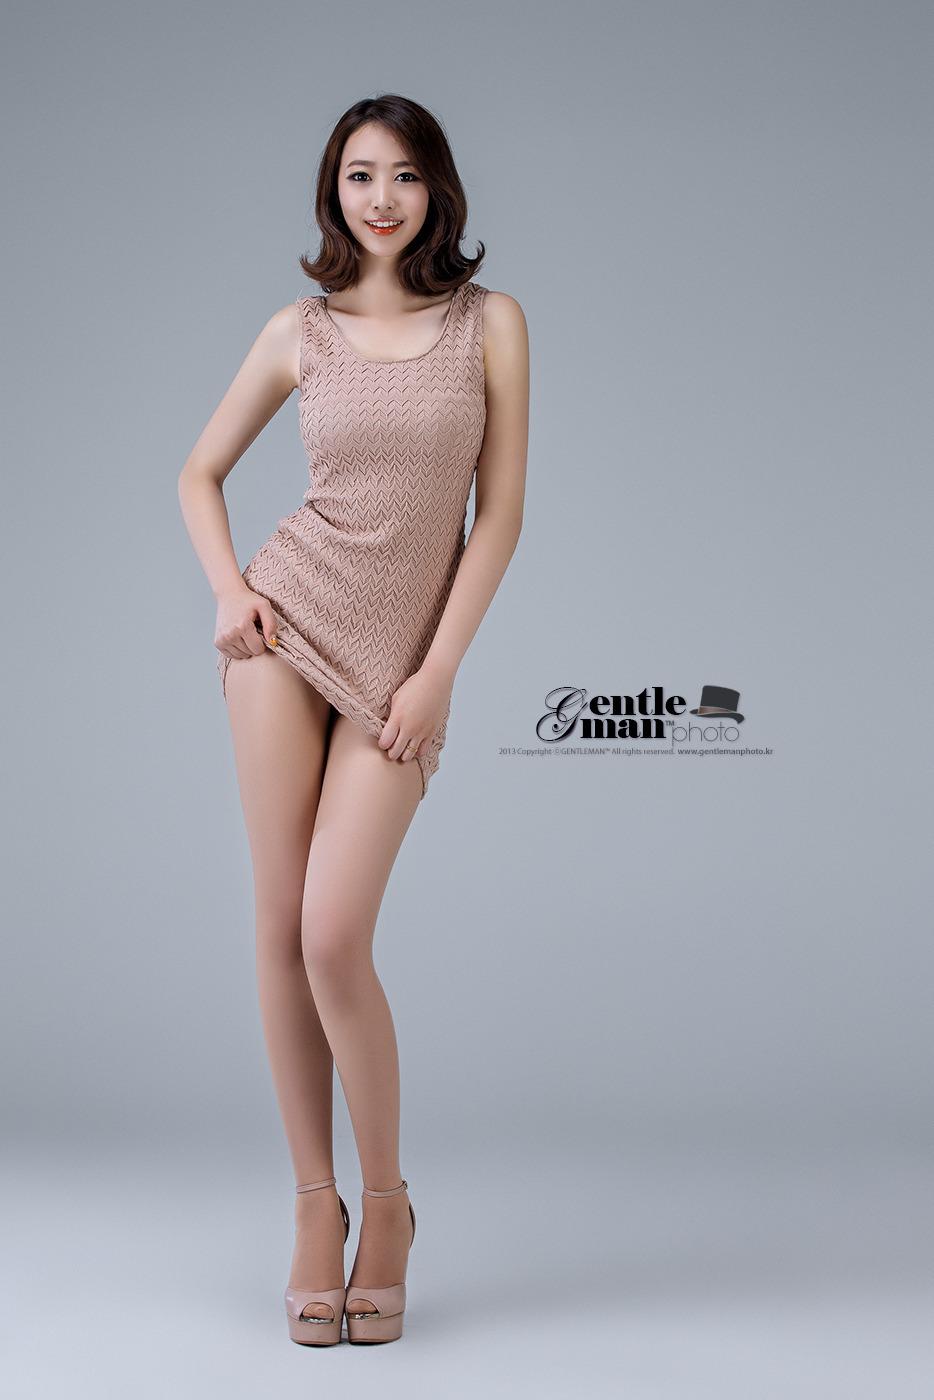 Sexy mini shorts babes